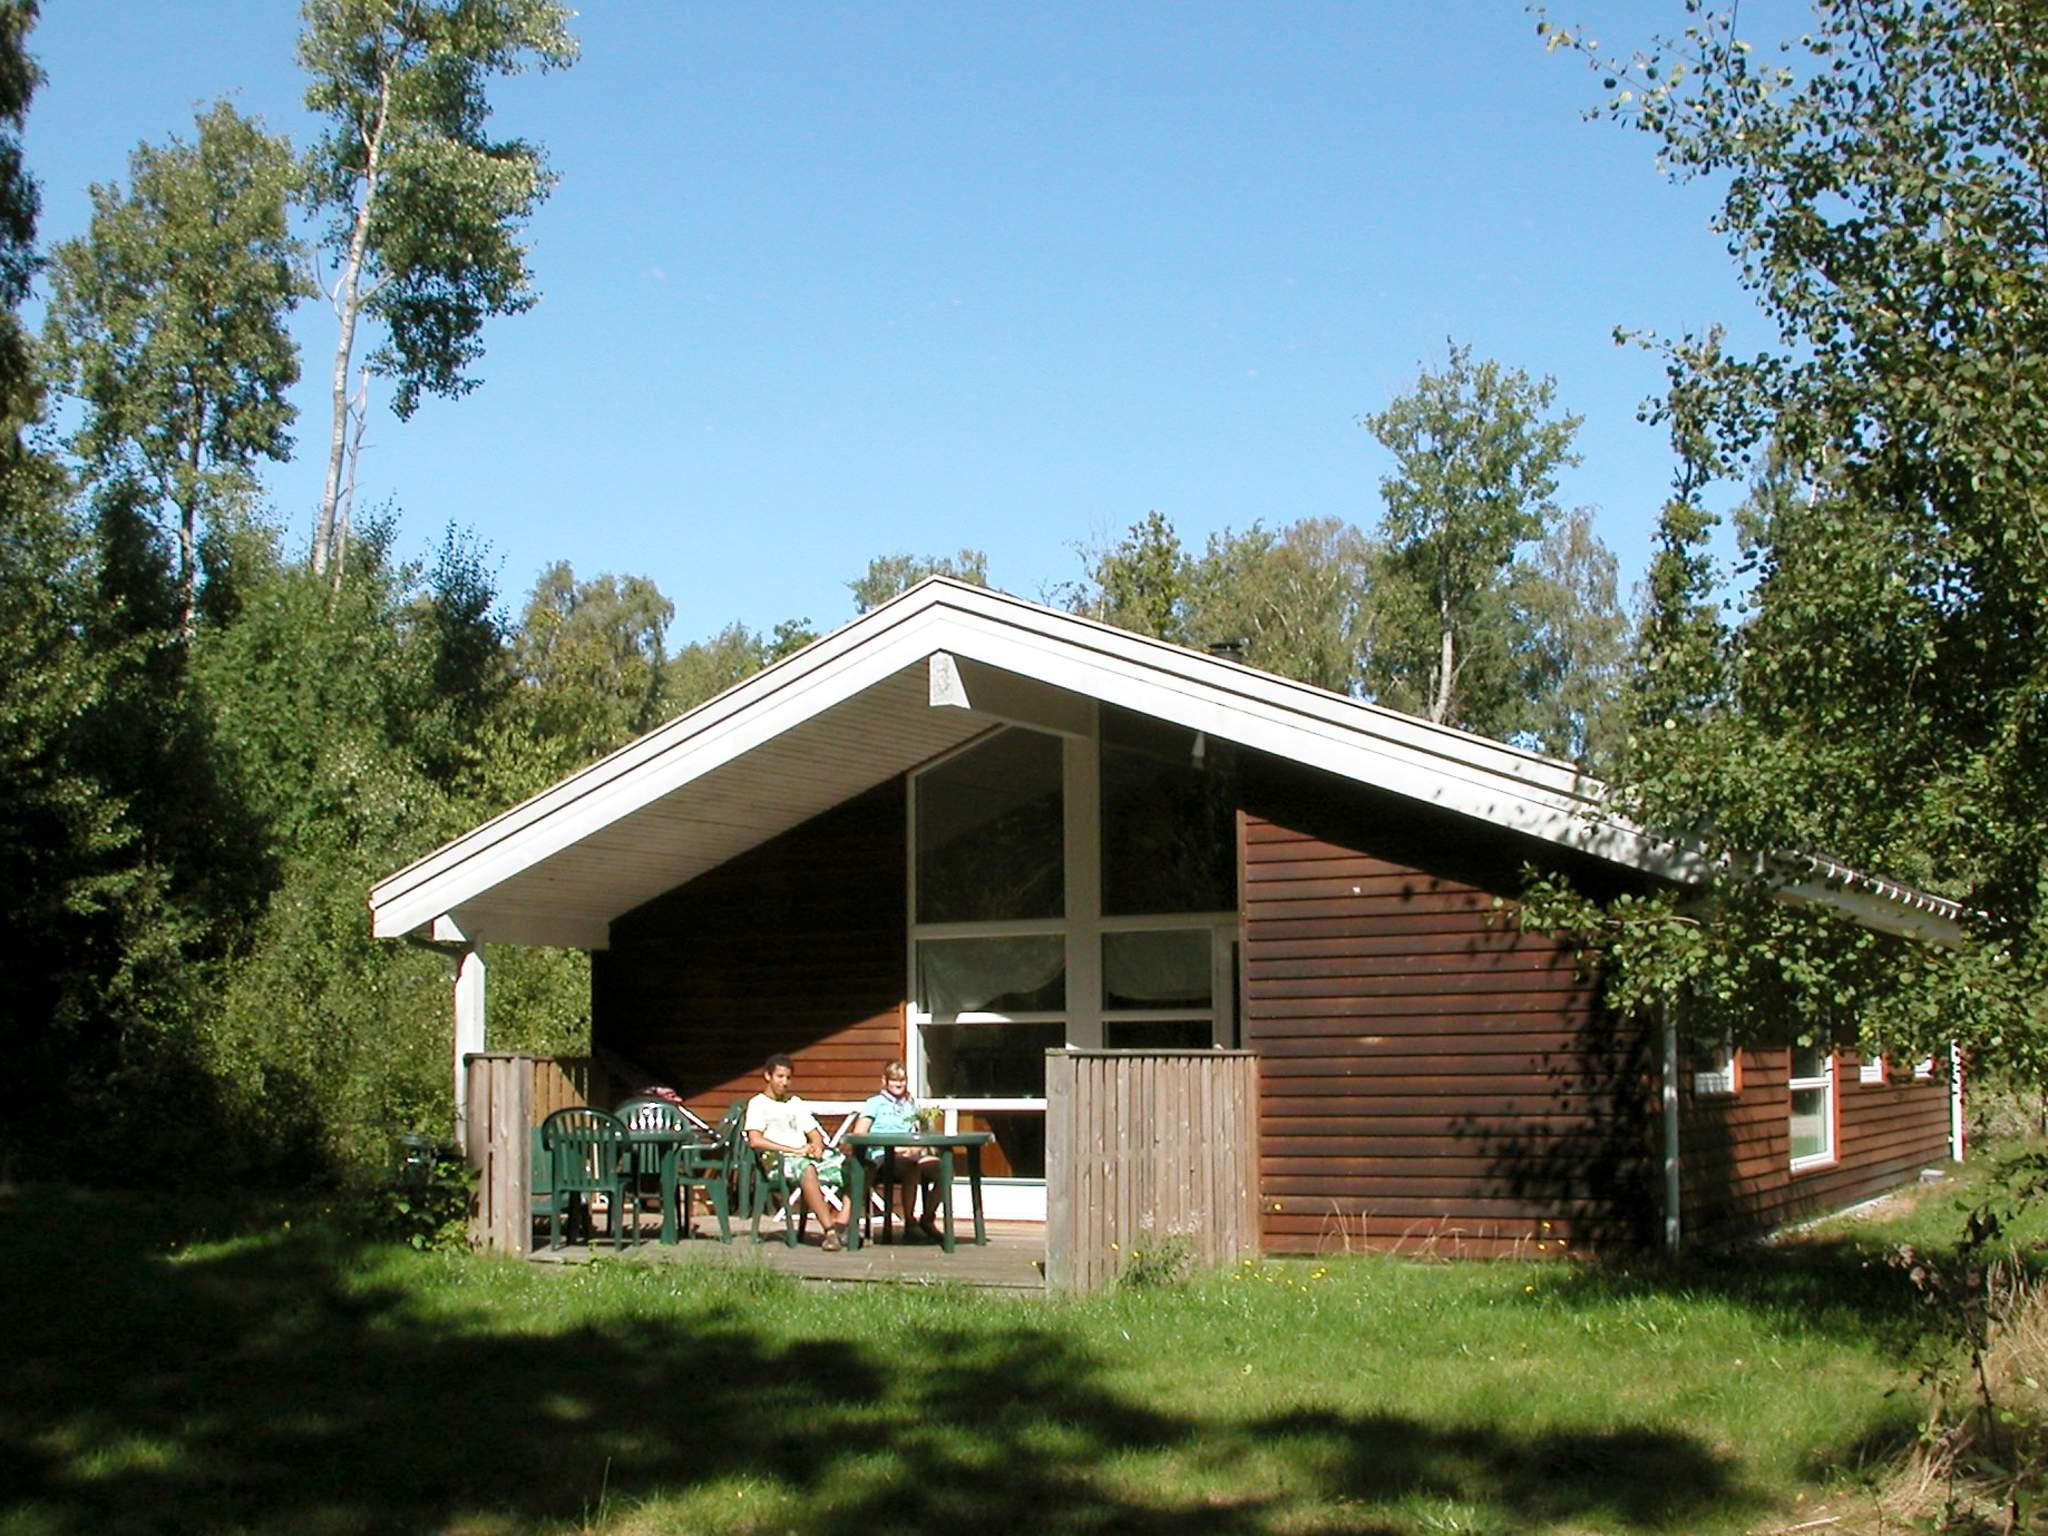 Ferienhaus Hasle (83419), Hasle, , Bornholm, Dänemark, Bild 1